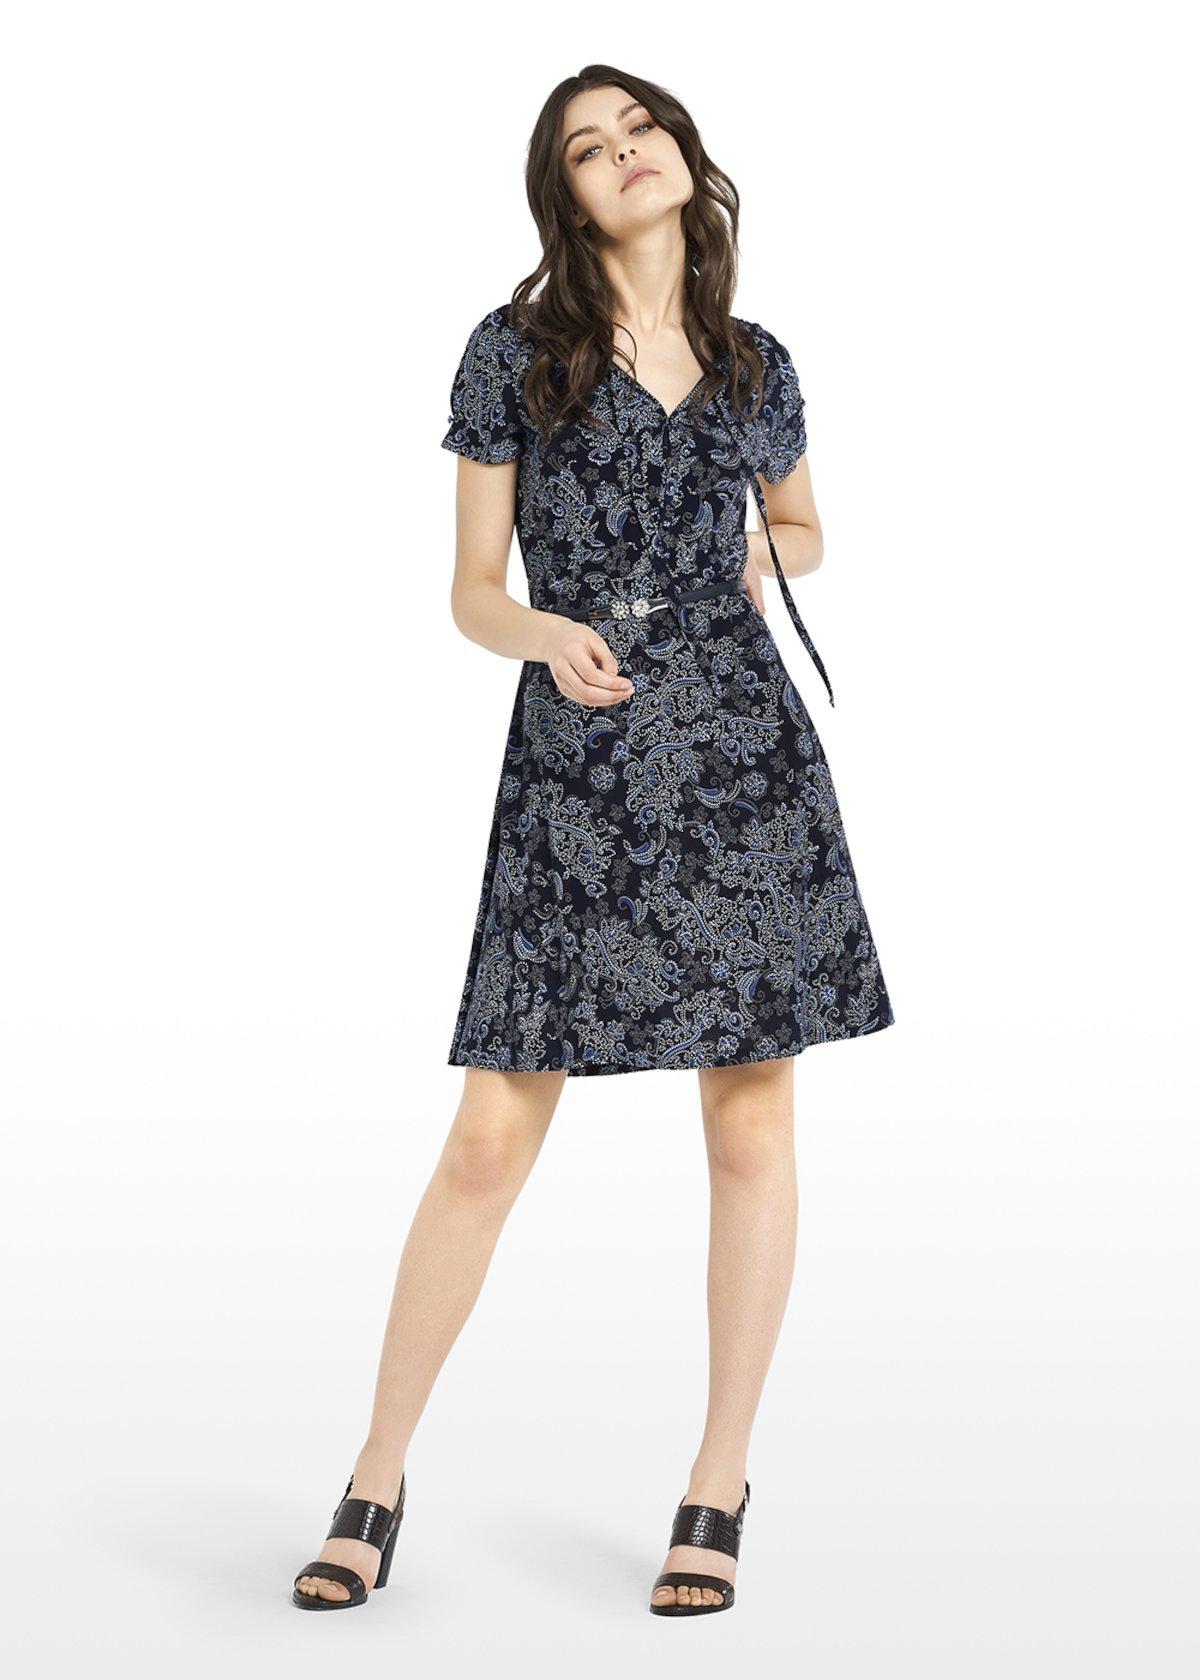 Jersey Afry dress cashmere fantasy - Blue / Avion Fantasia - Woman - Category image